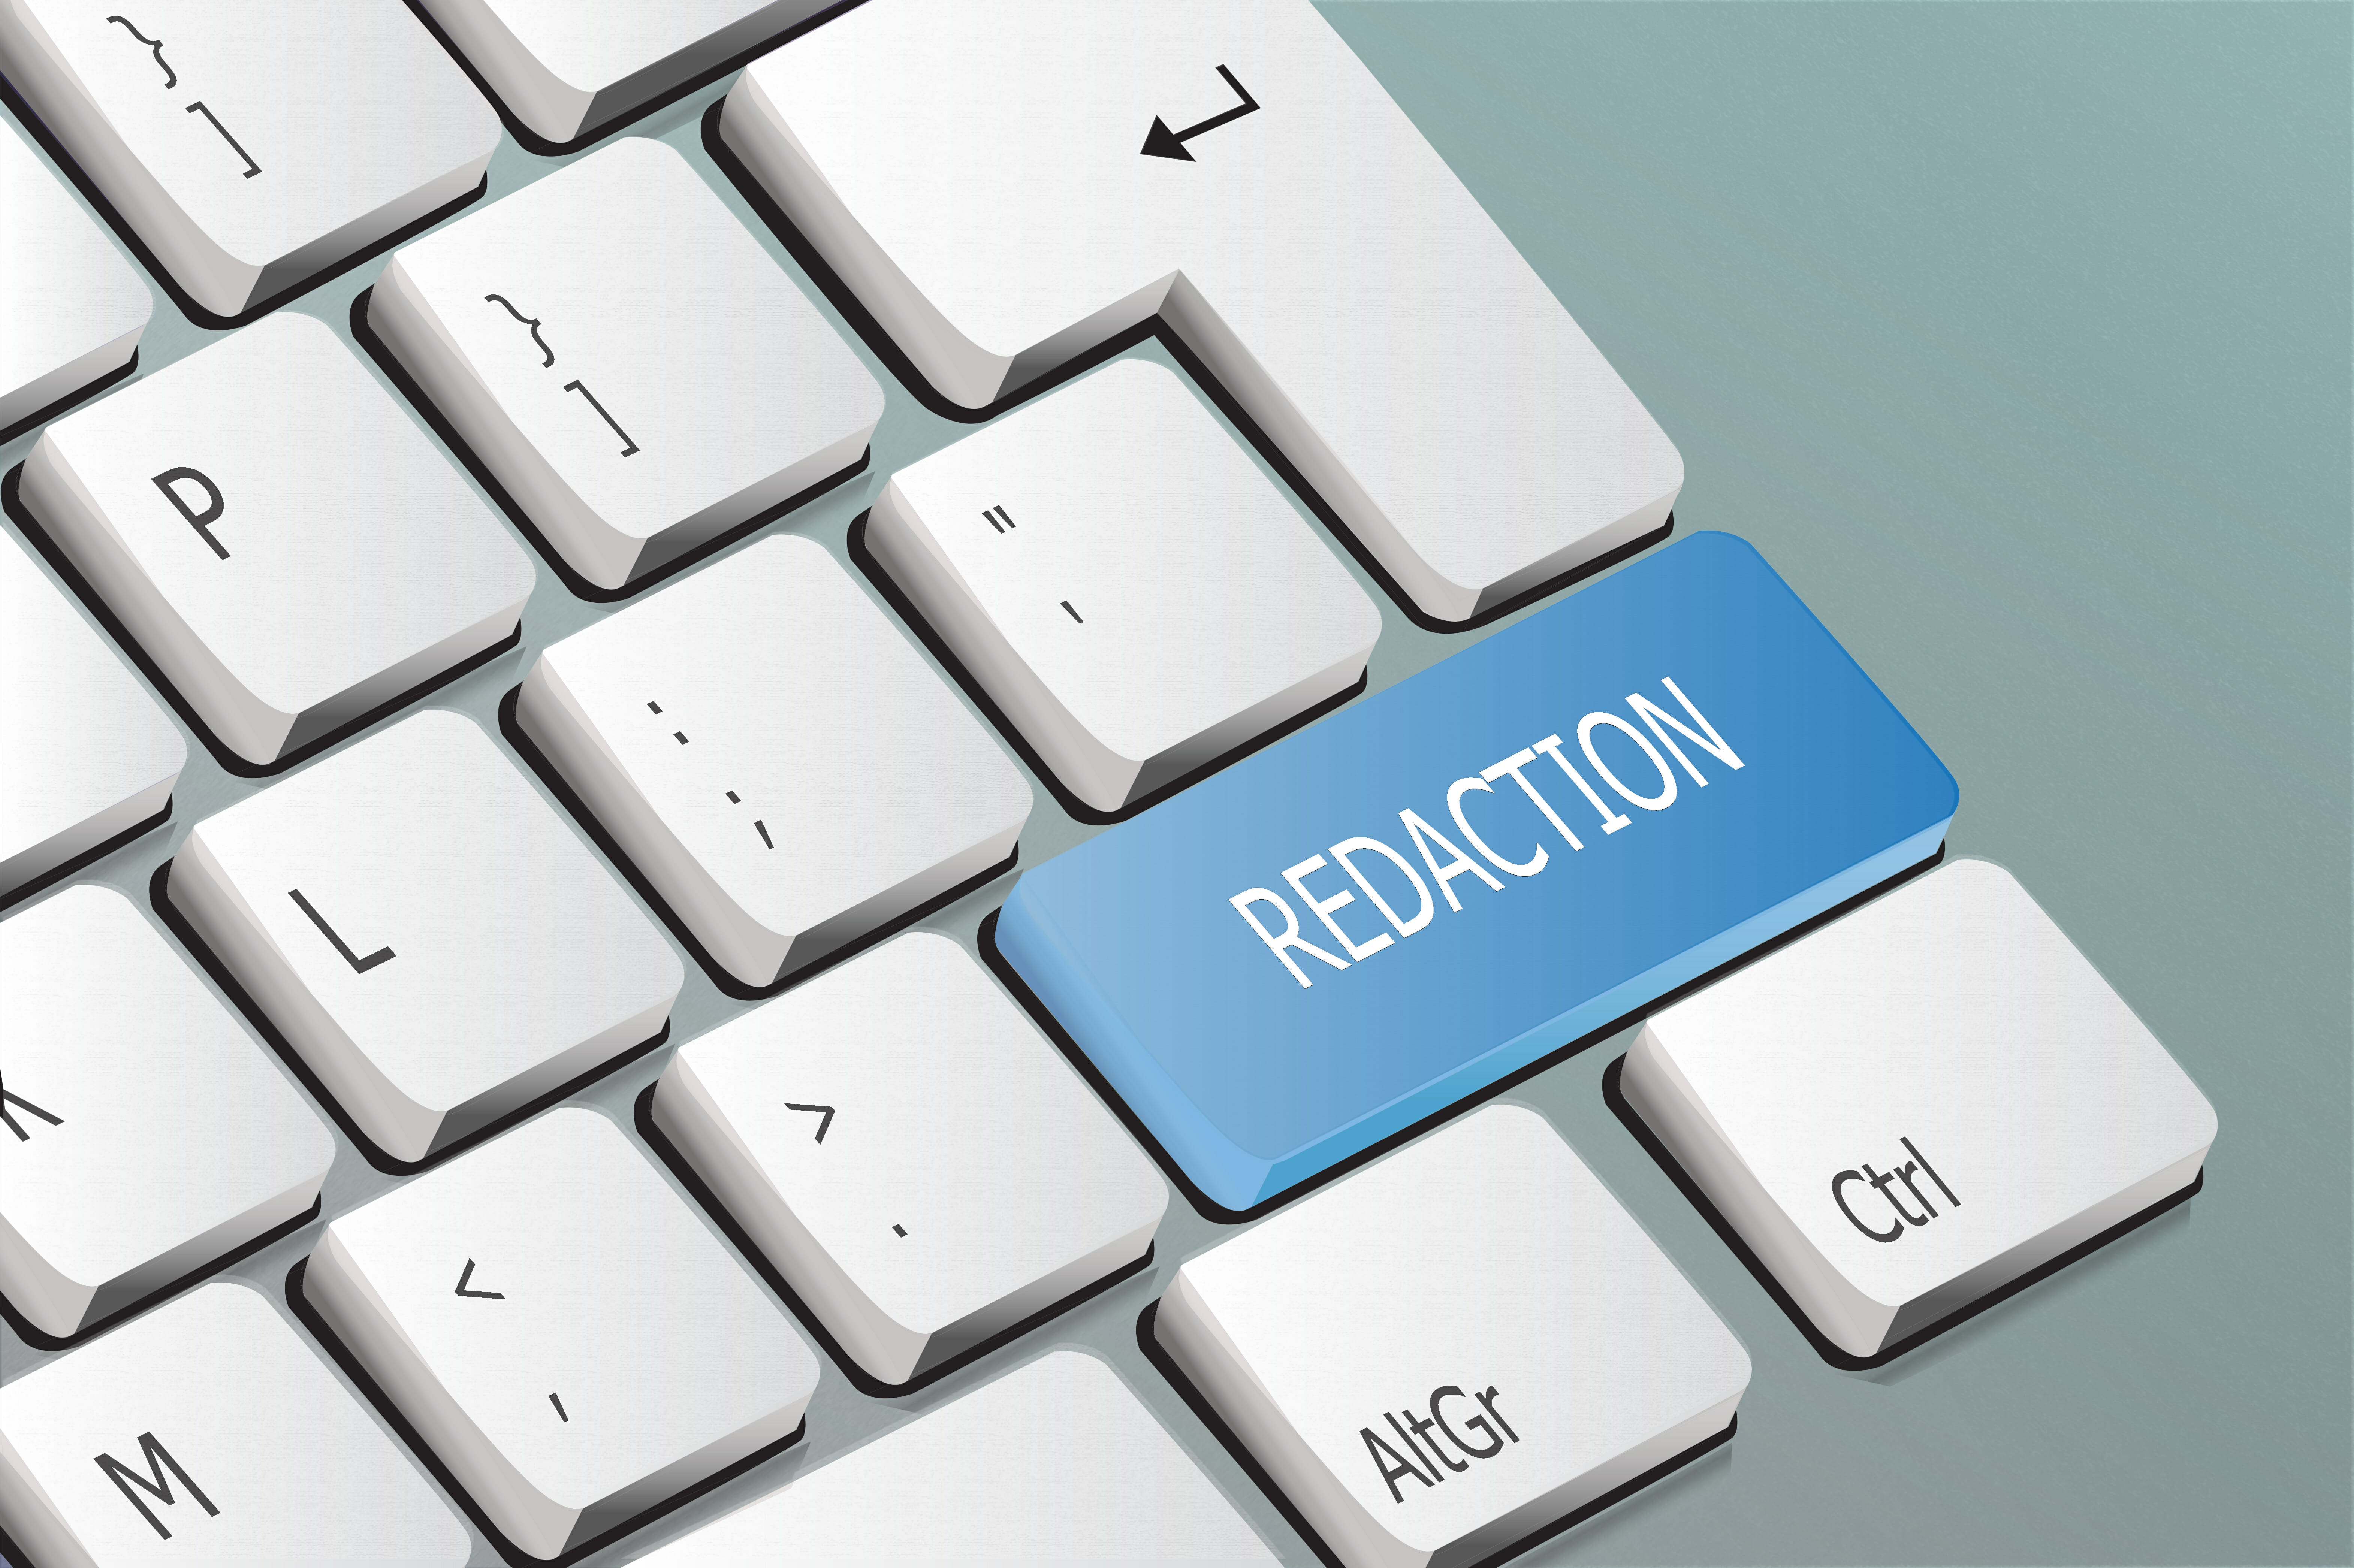 redaction service